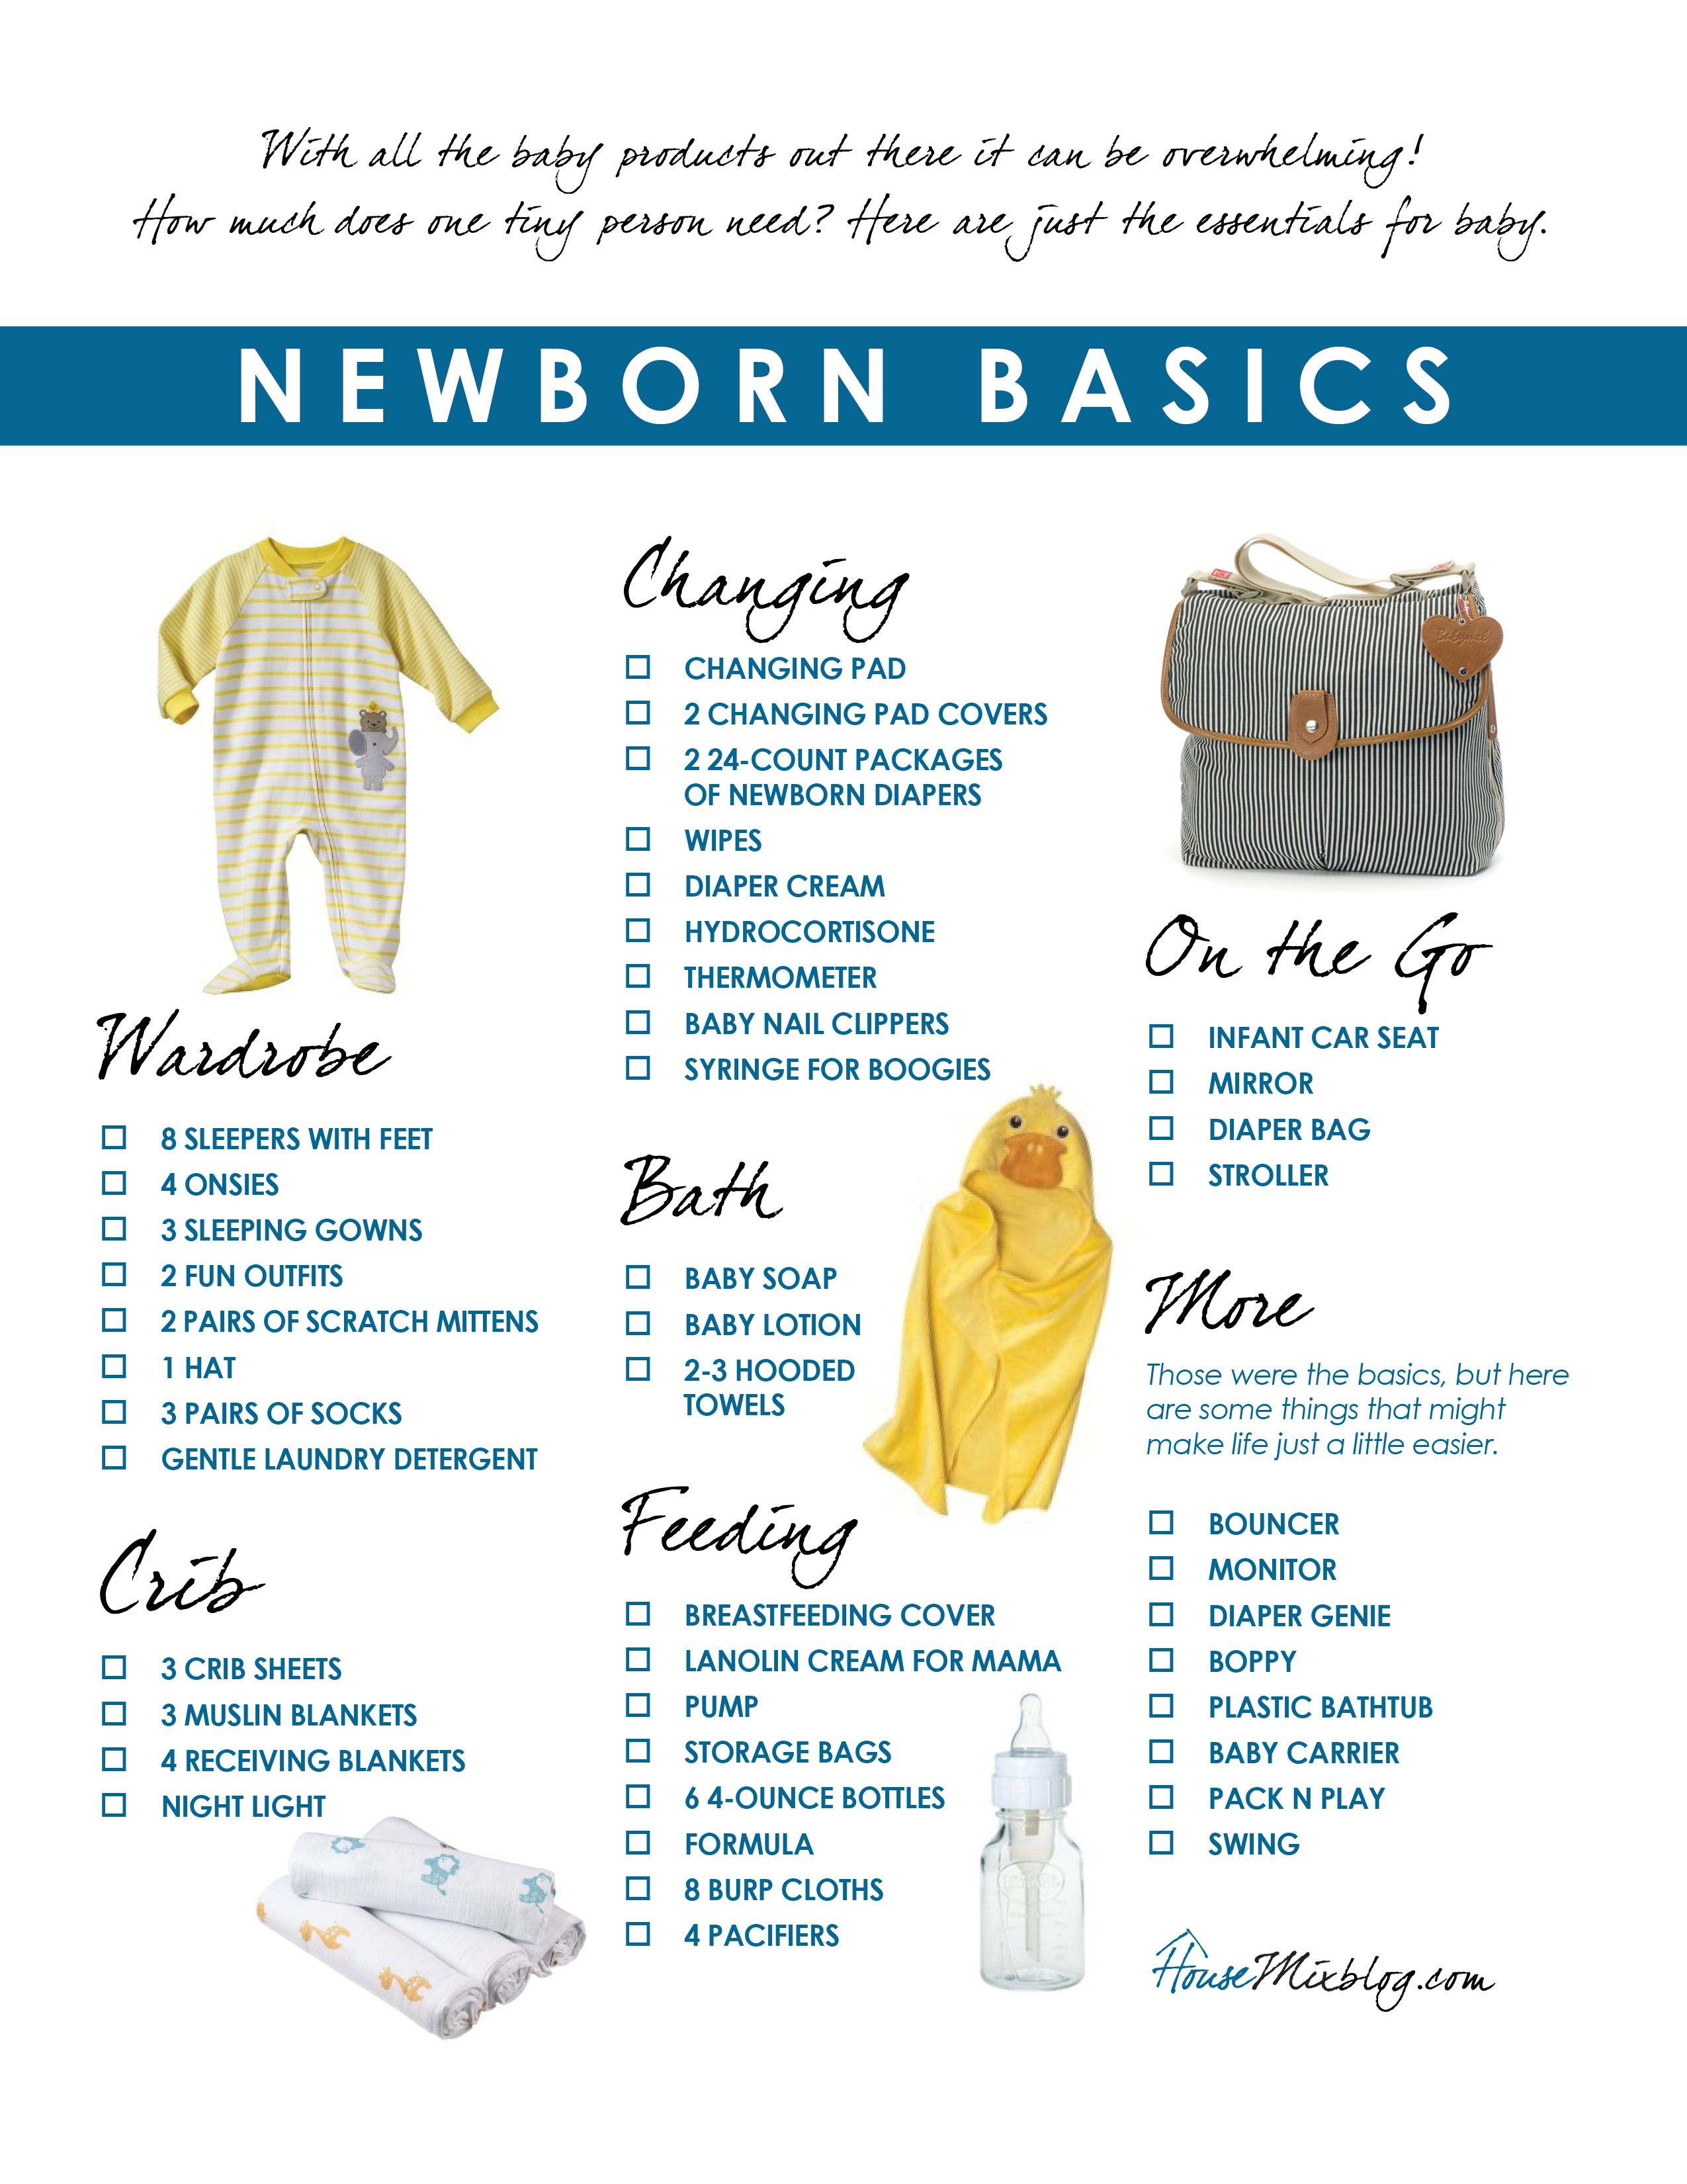 737e5c58b Newborn basics registry checklist